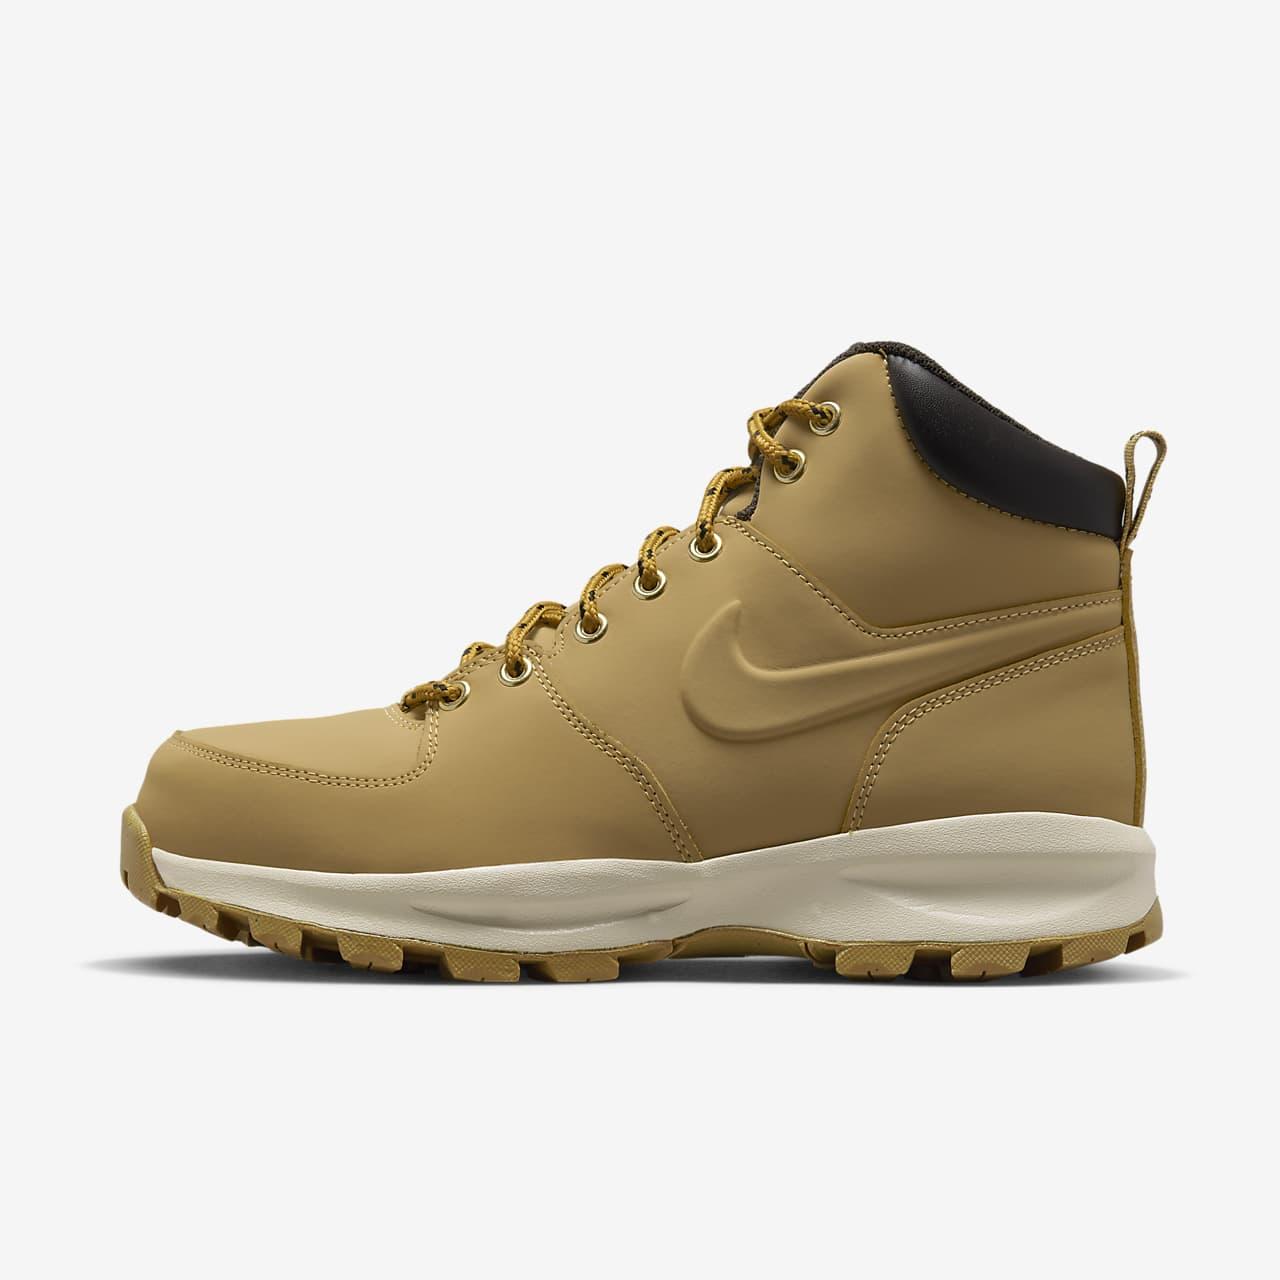 Nike Manoa Botas - Hombre